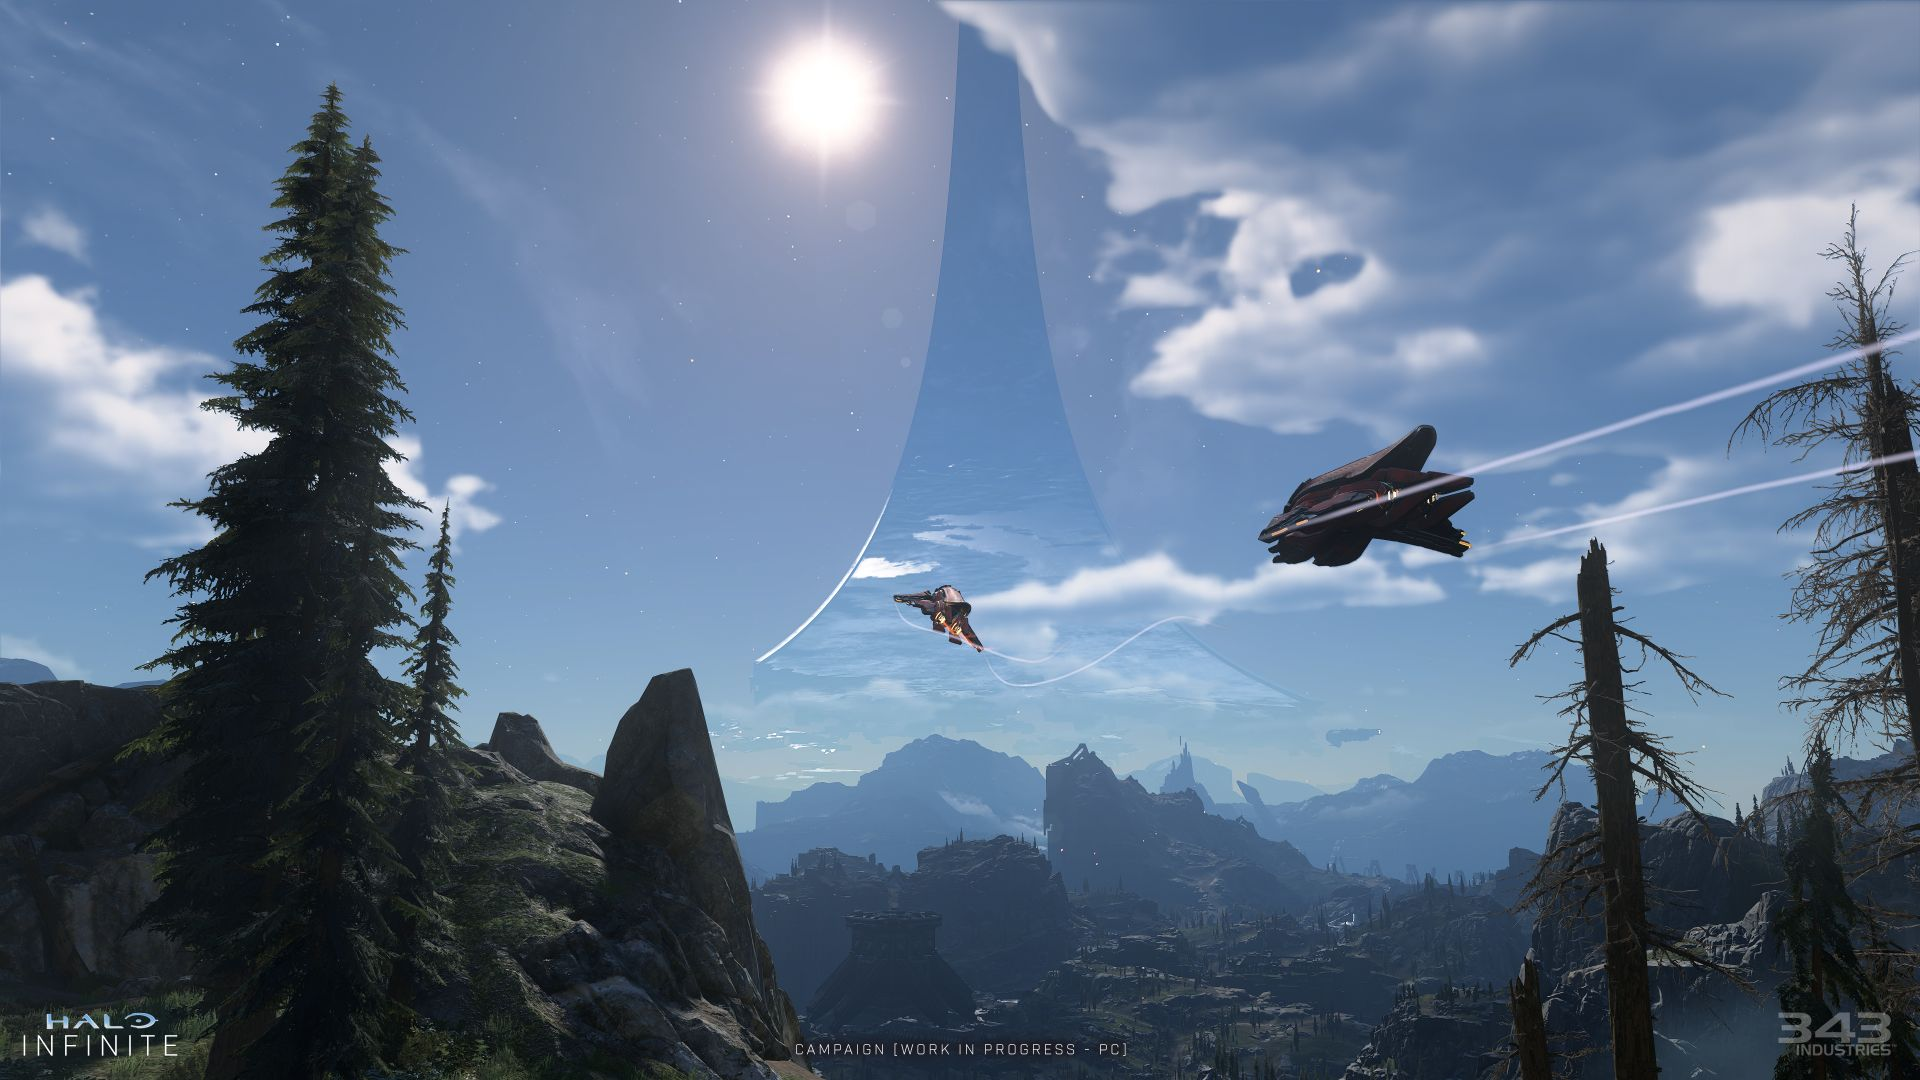 Halo Infinite، وسیع ترین و پرماجراترین بازی مجموعه هیلو